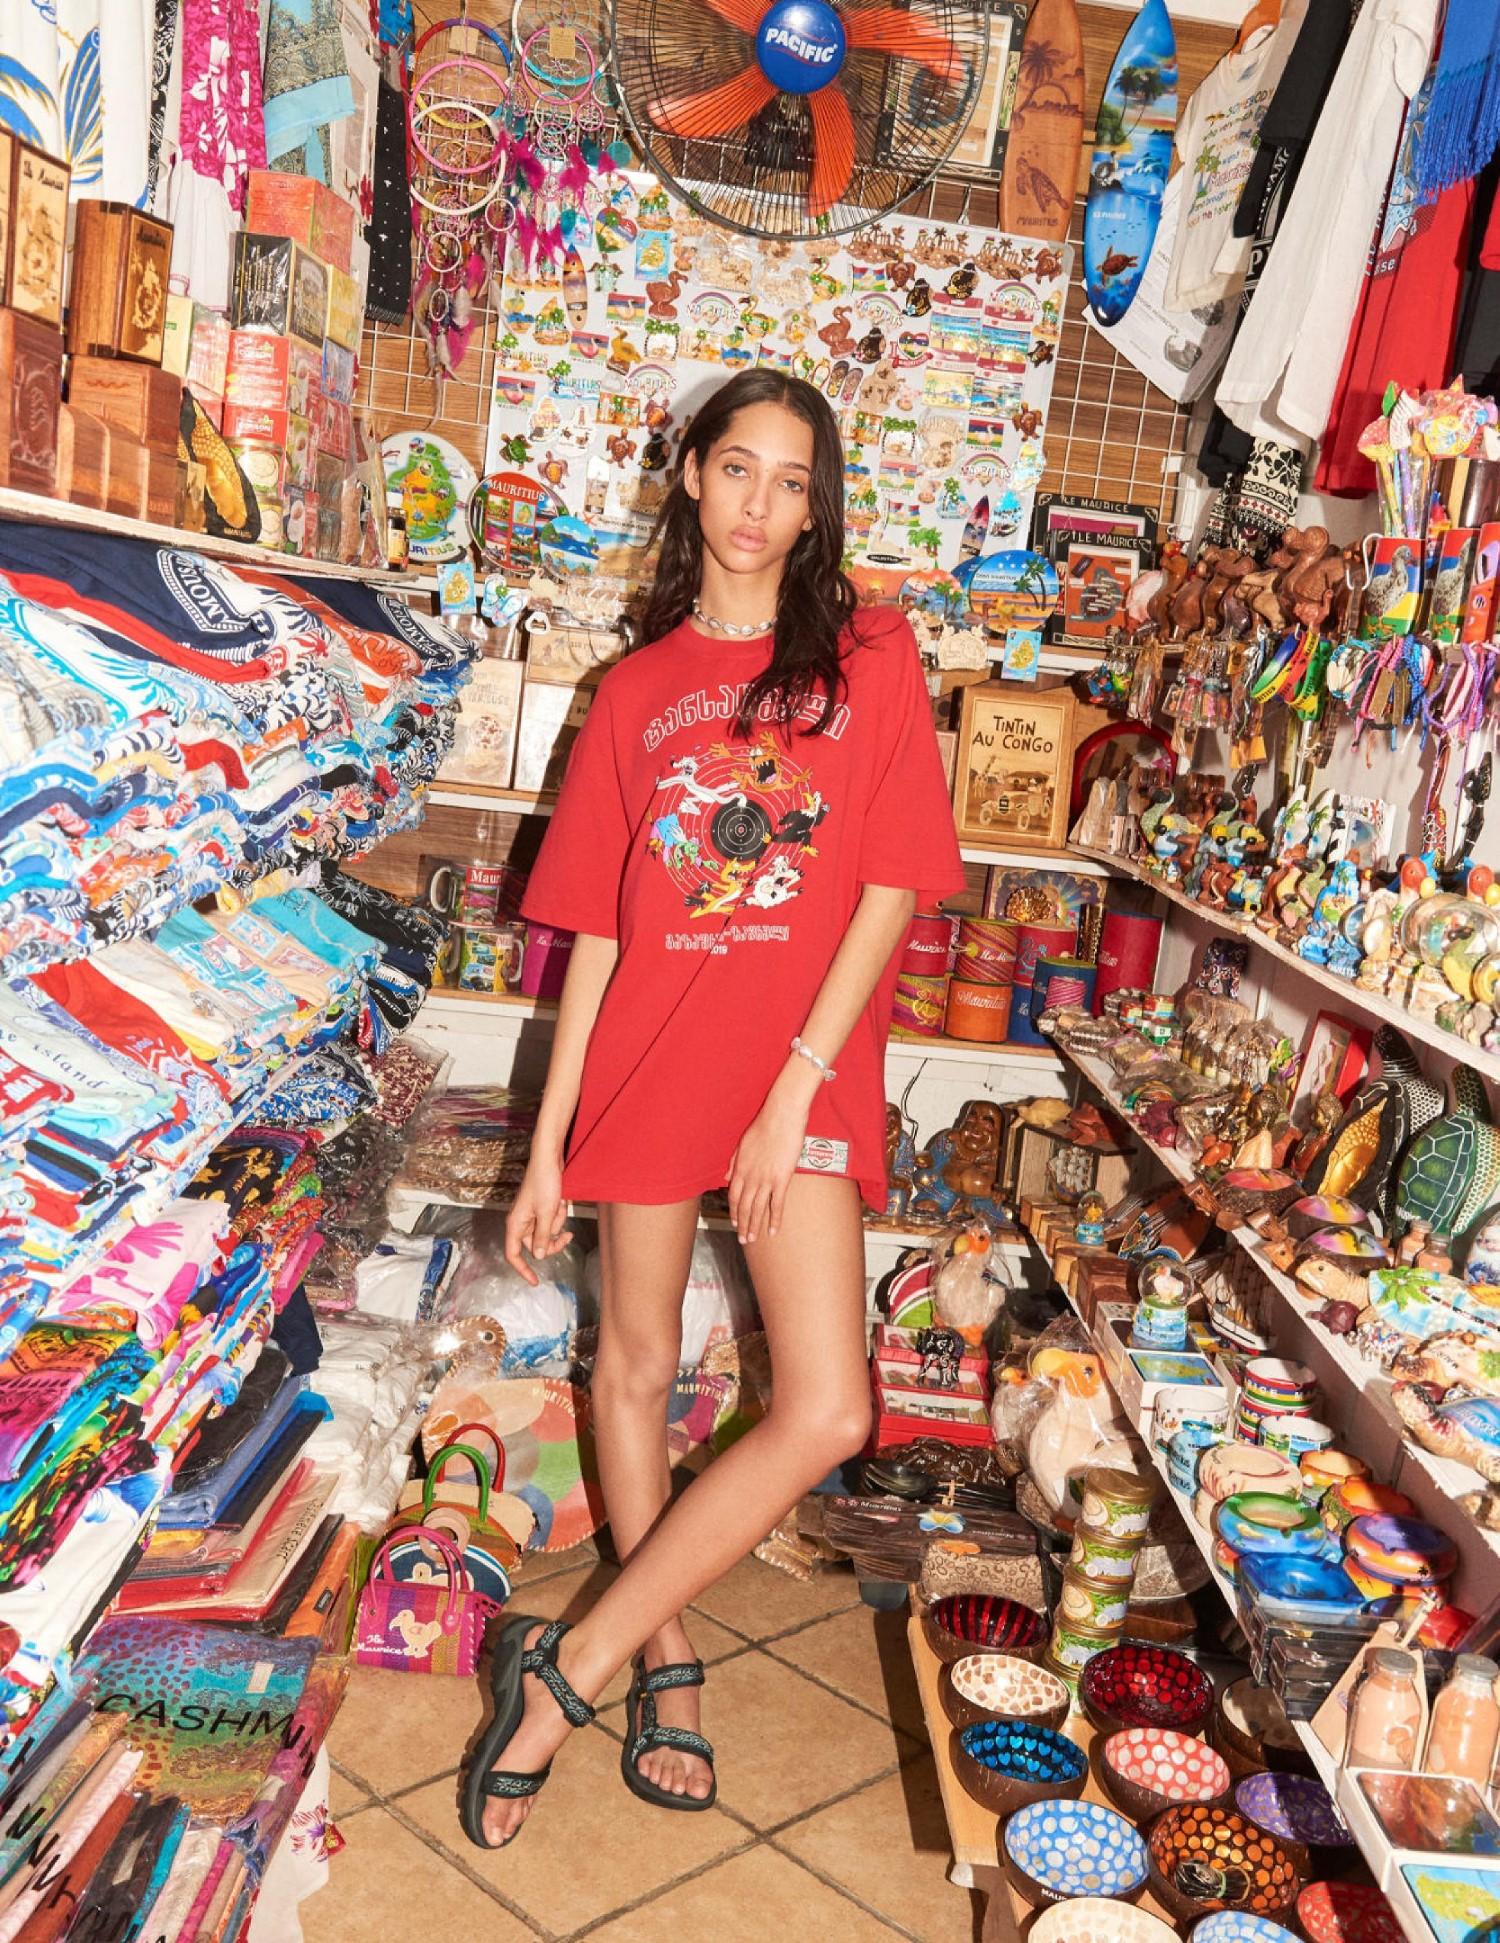 Yasmin Wijnaldum Tung Walsh Vogue Netherlands June 2019 (7).jpg